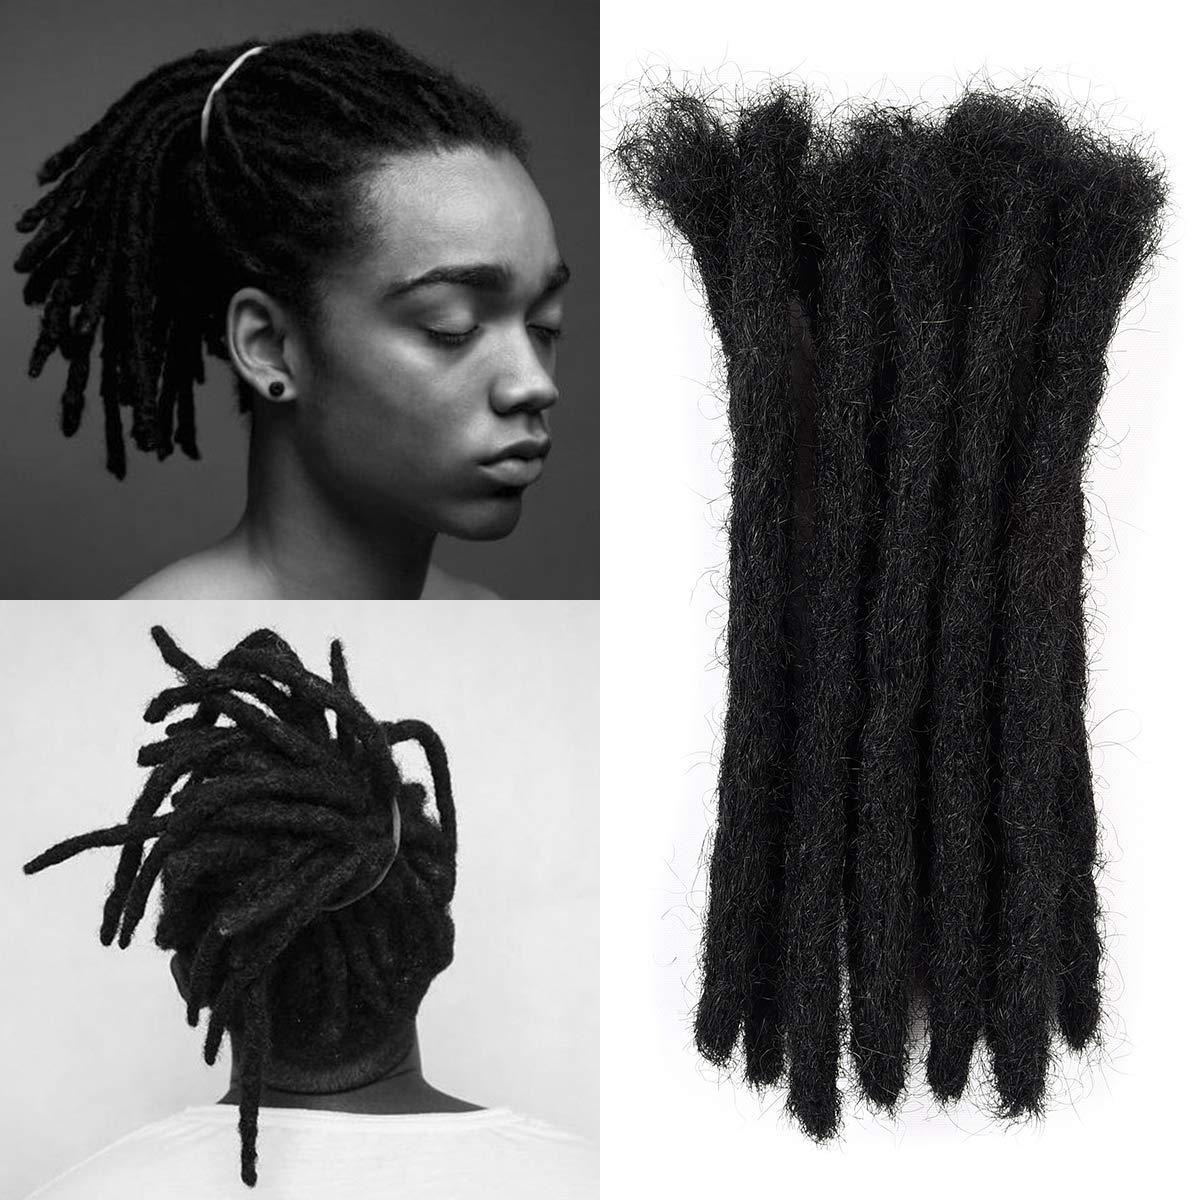 Hot Selling! 5Pcs/Lot 12 inch Handmade Dreadlocks Extensions Reggae Hair Hip-Hop Style Synthetic Braiding Hair From Maya Culture For Men